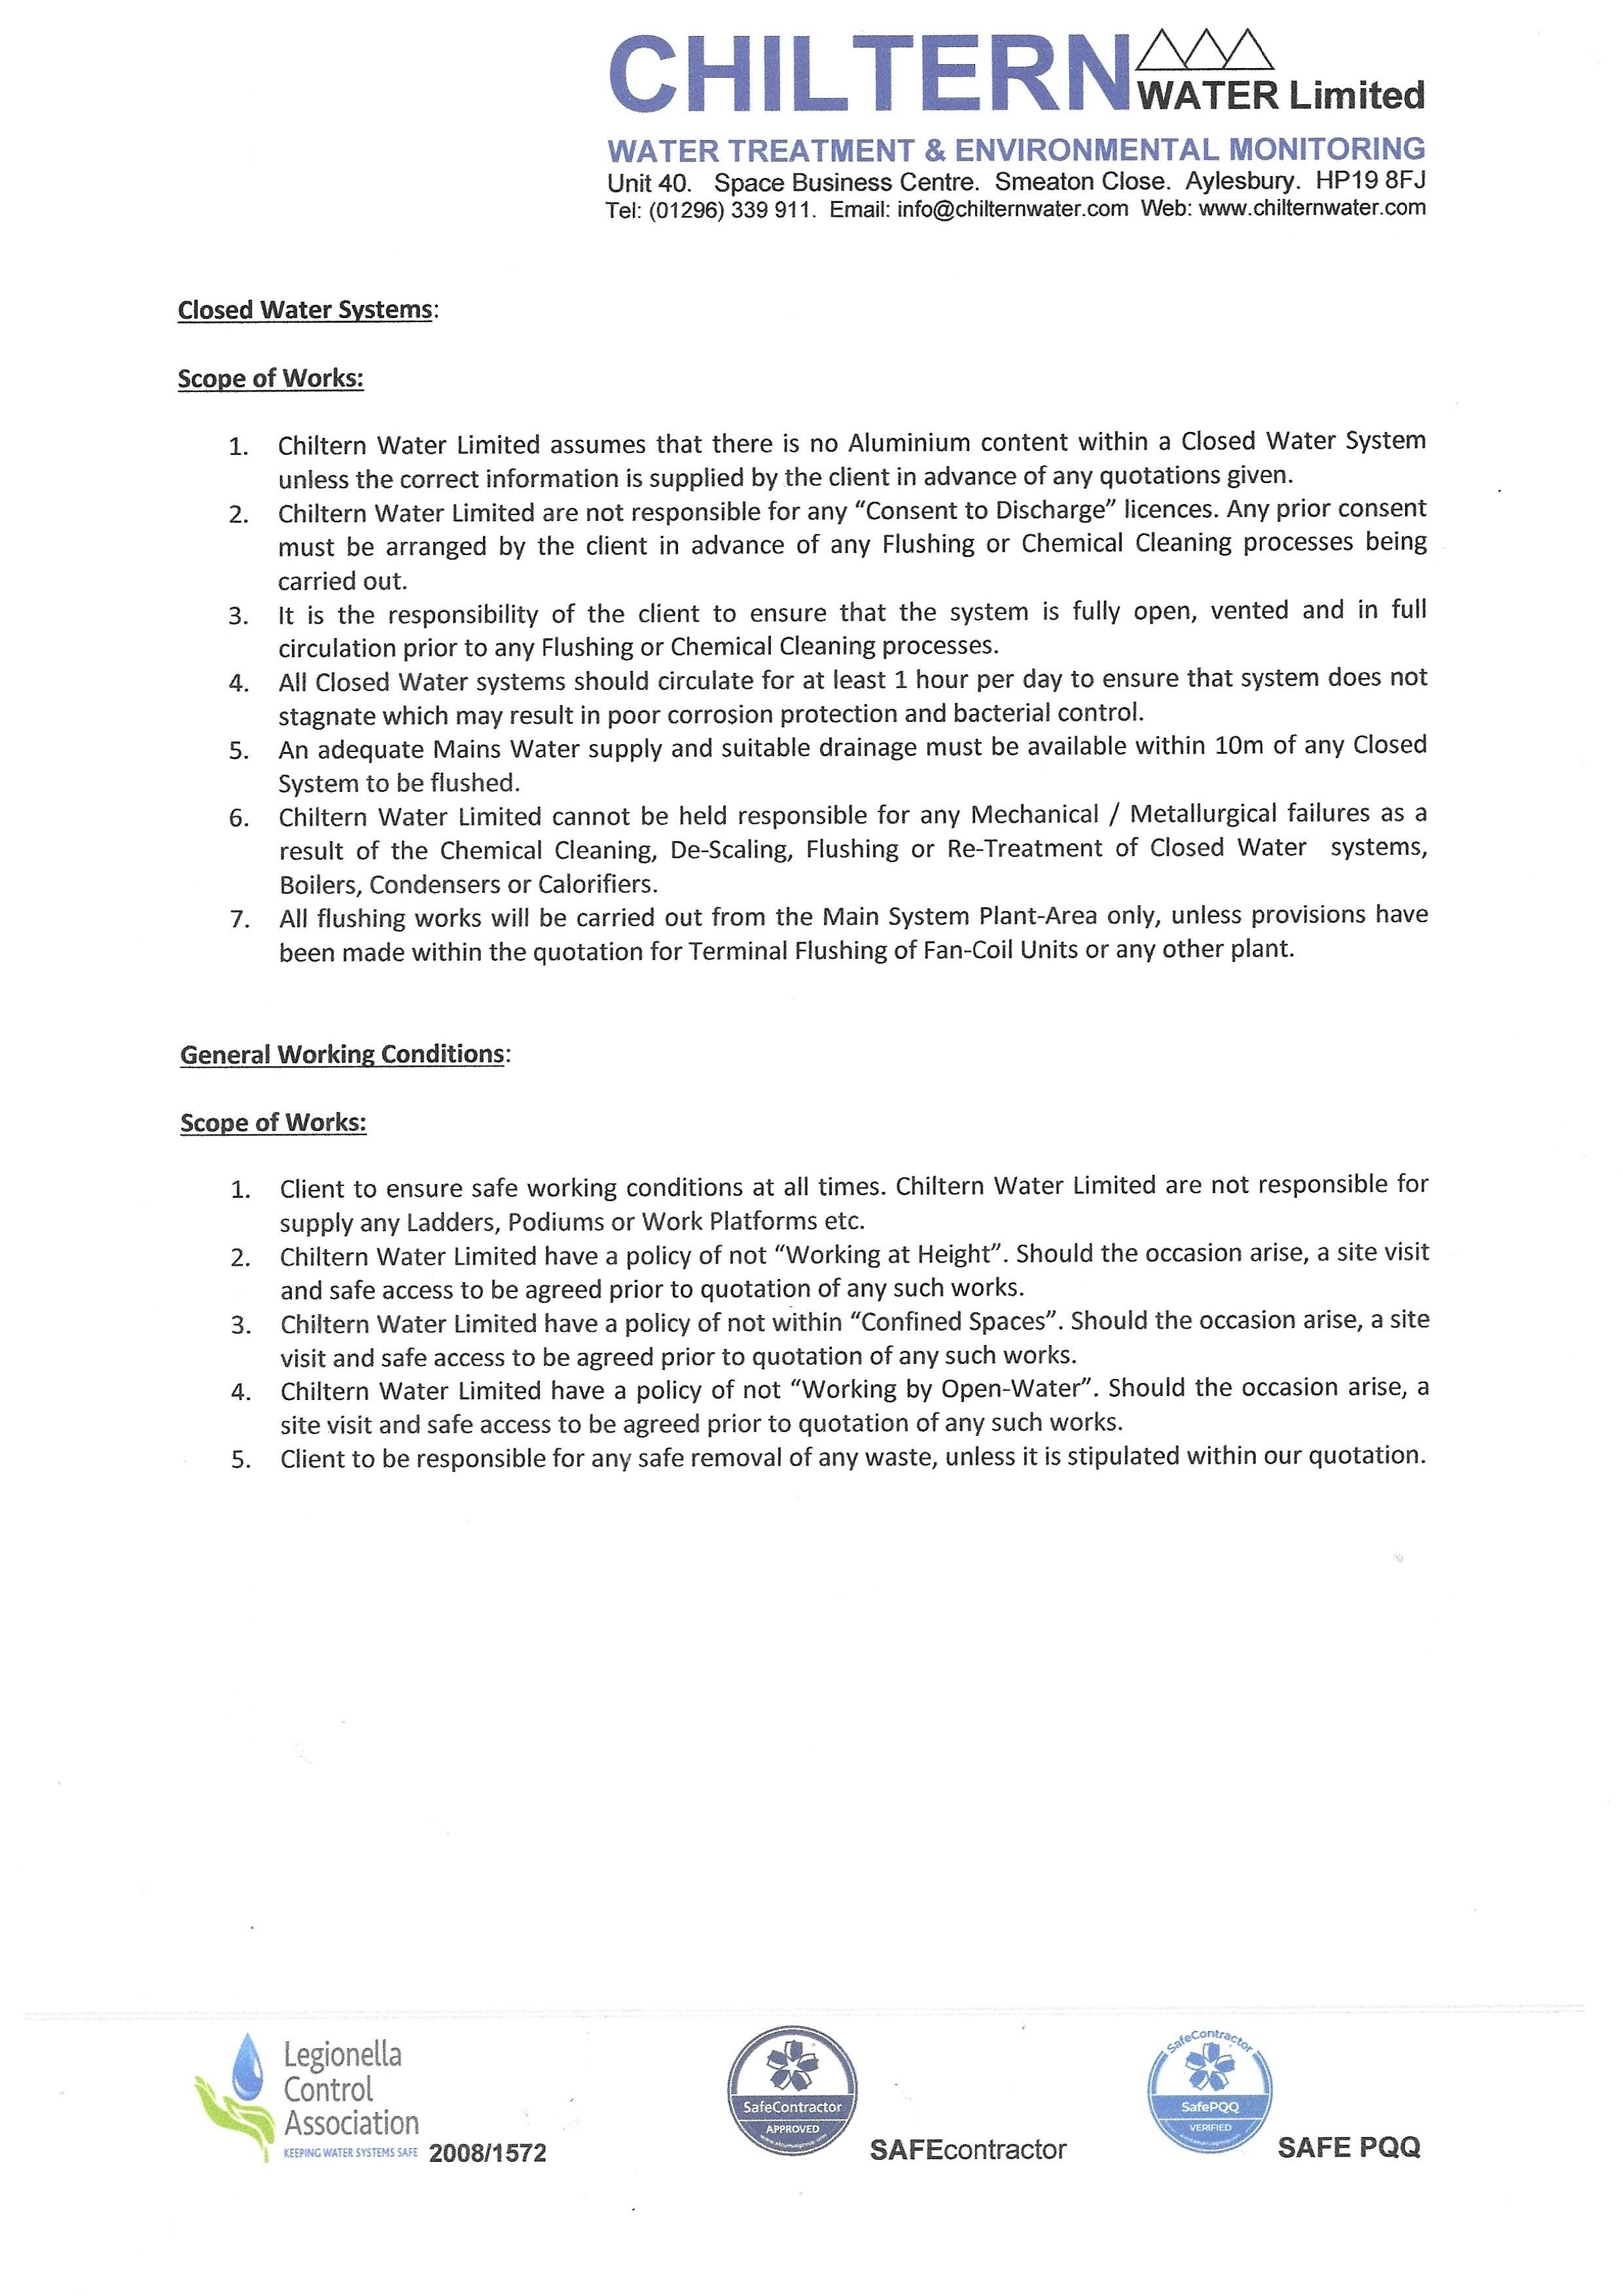 https://0501.nccdn.net/4_2/000/000/071/260/document_2020-11-13_140108--5-.jpg